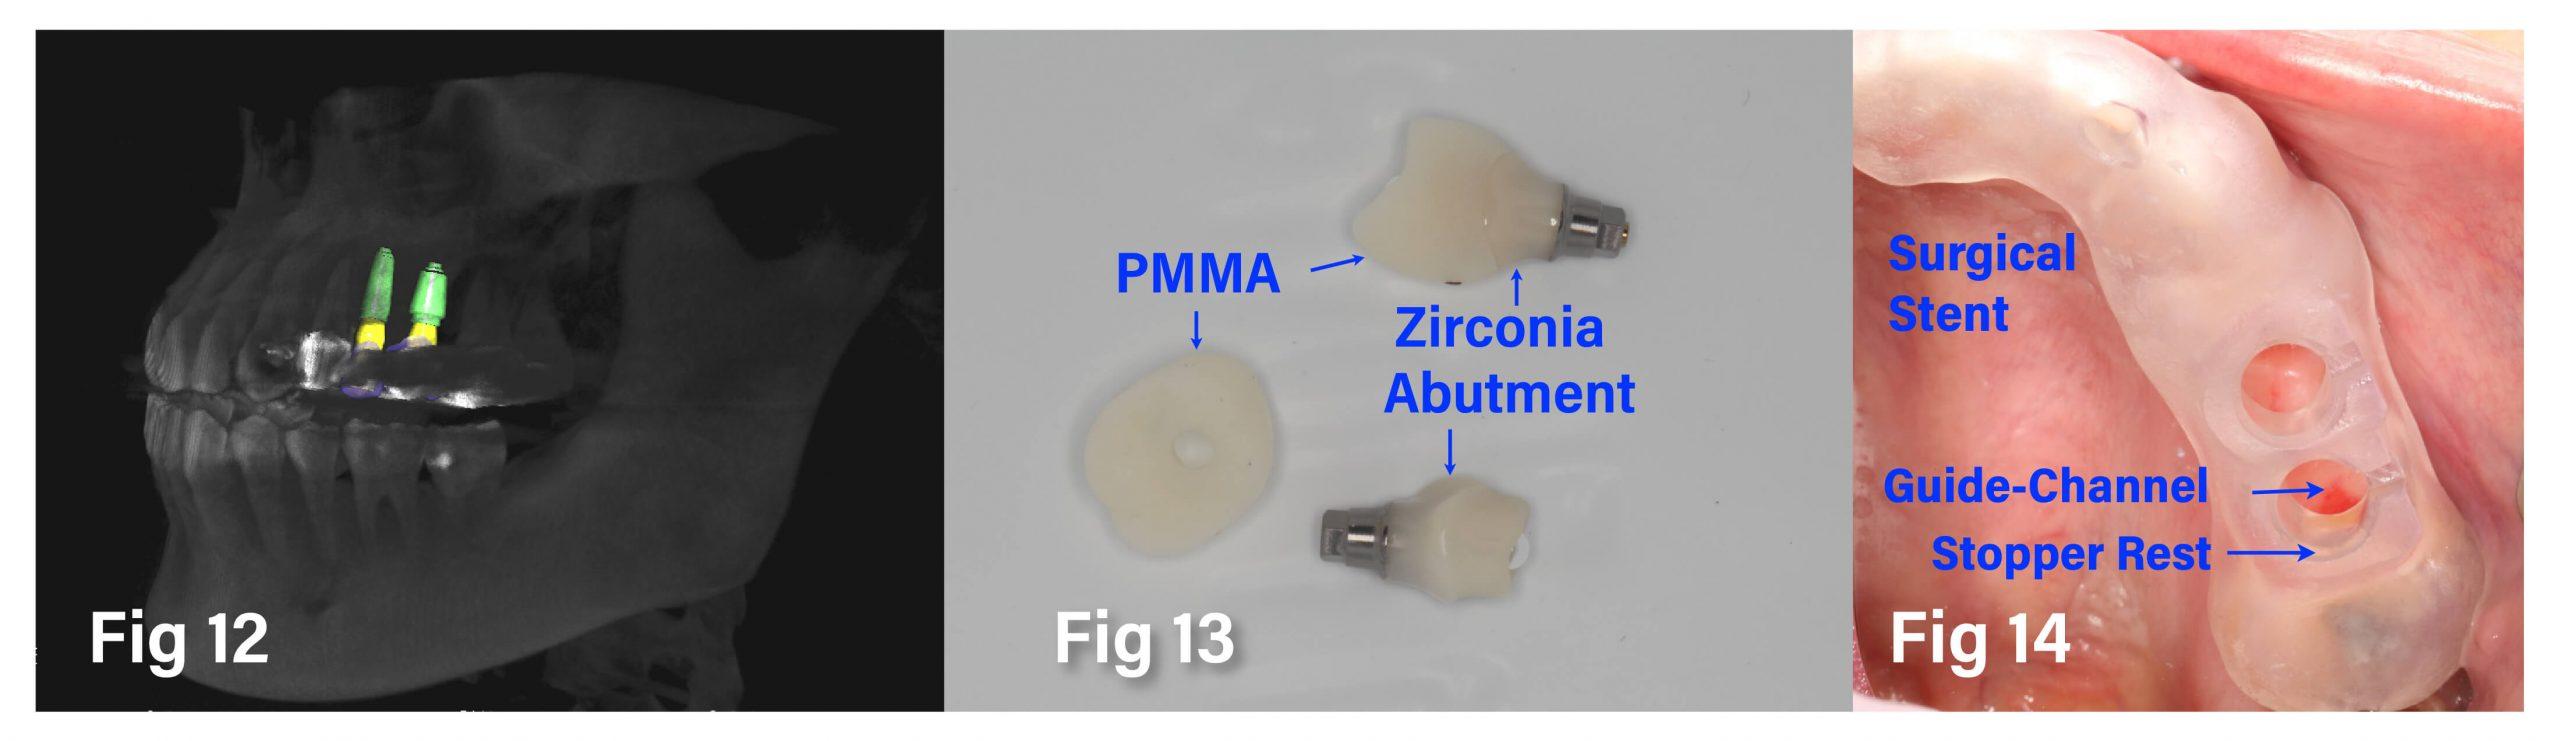 Fig.13-14 完成 Surgical Stent、Zirconia Abutment 和 PMMA Provision 製作